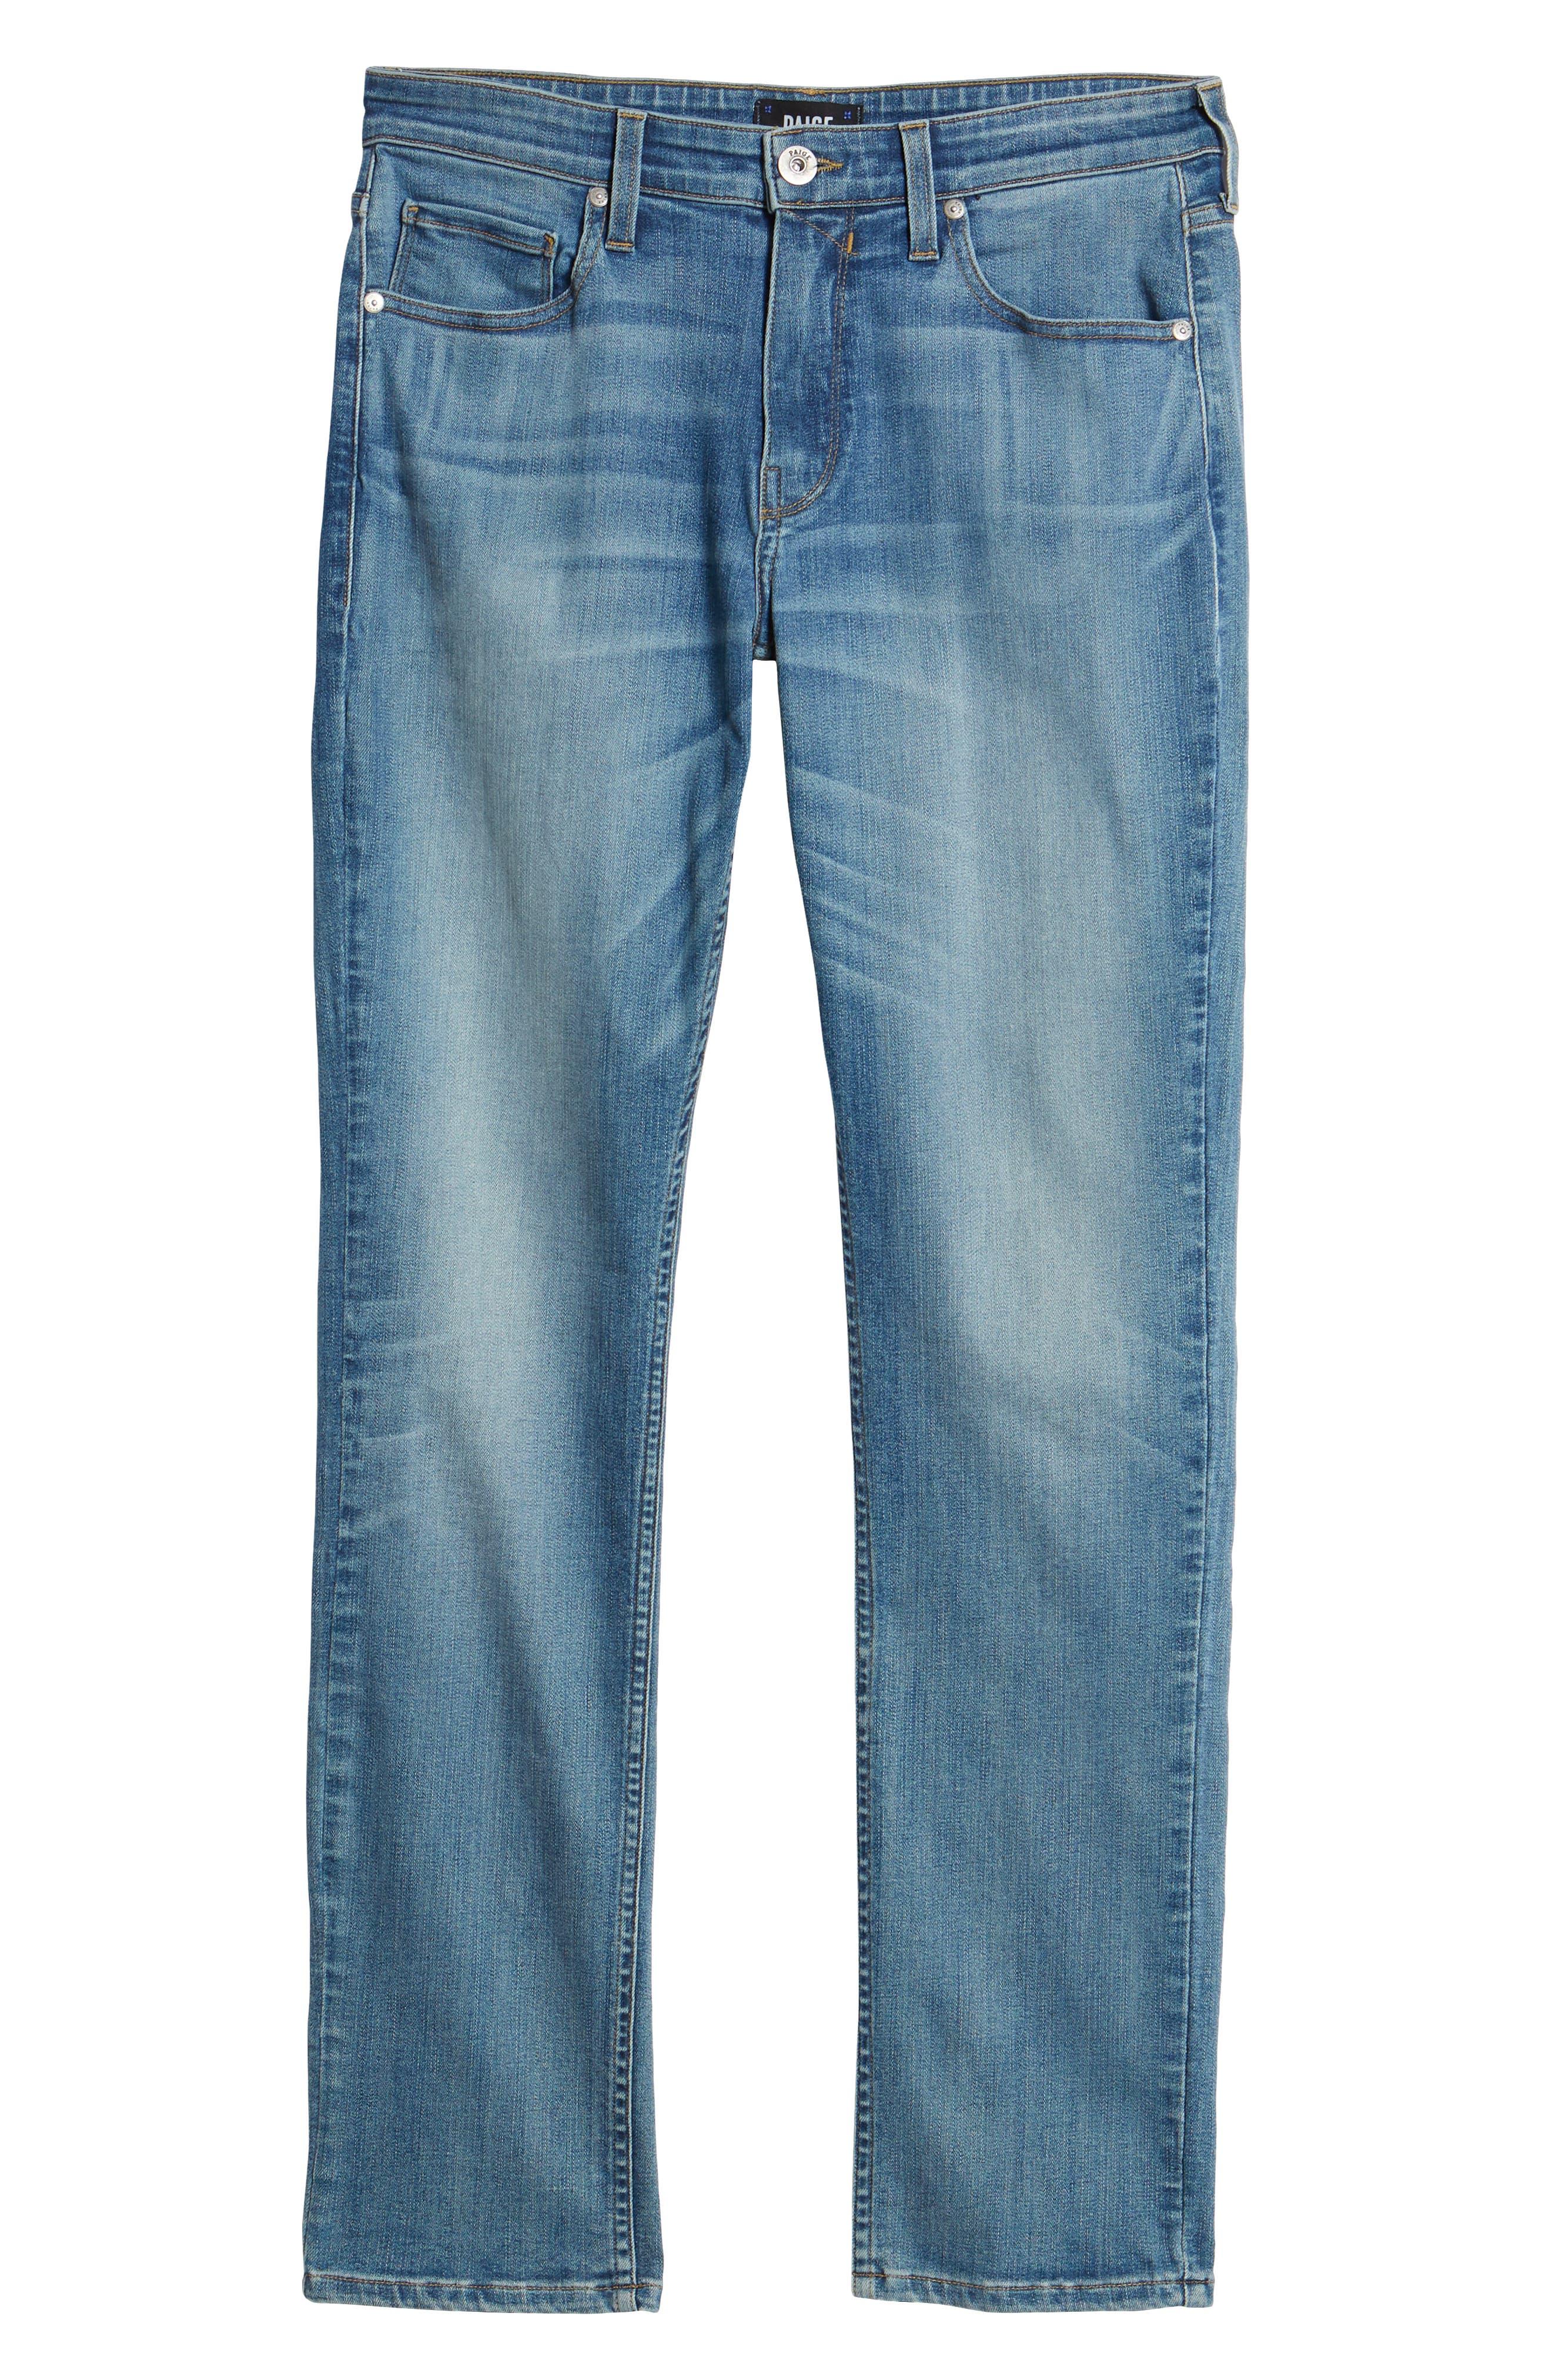 Transcend - Lennox Slim Fit Jeans,                             Alternate thumbnail 6, color,                             CARTWRIGHT